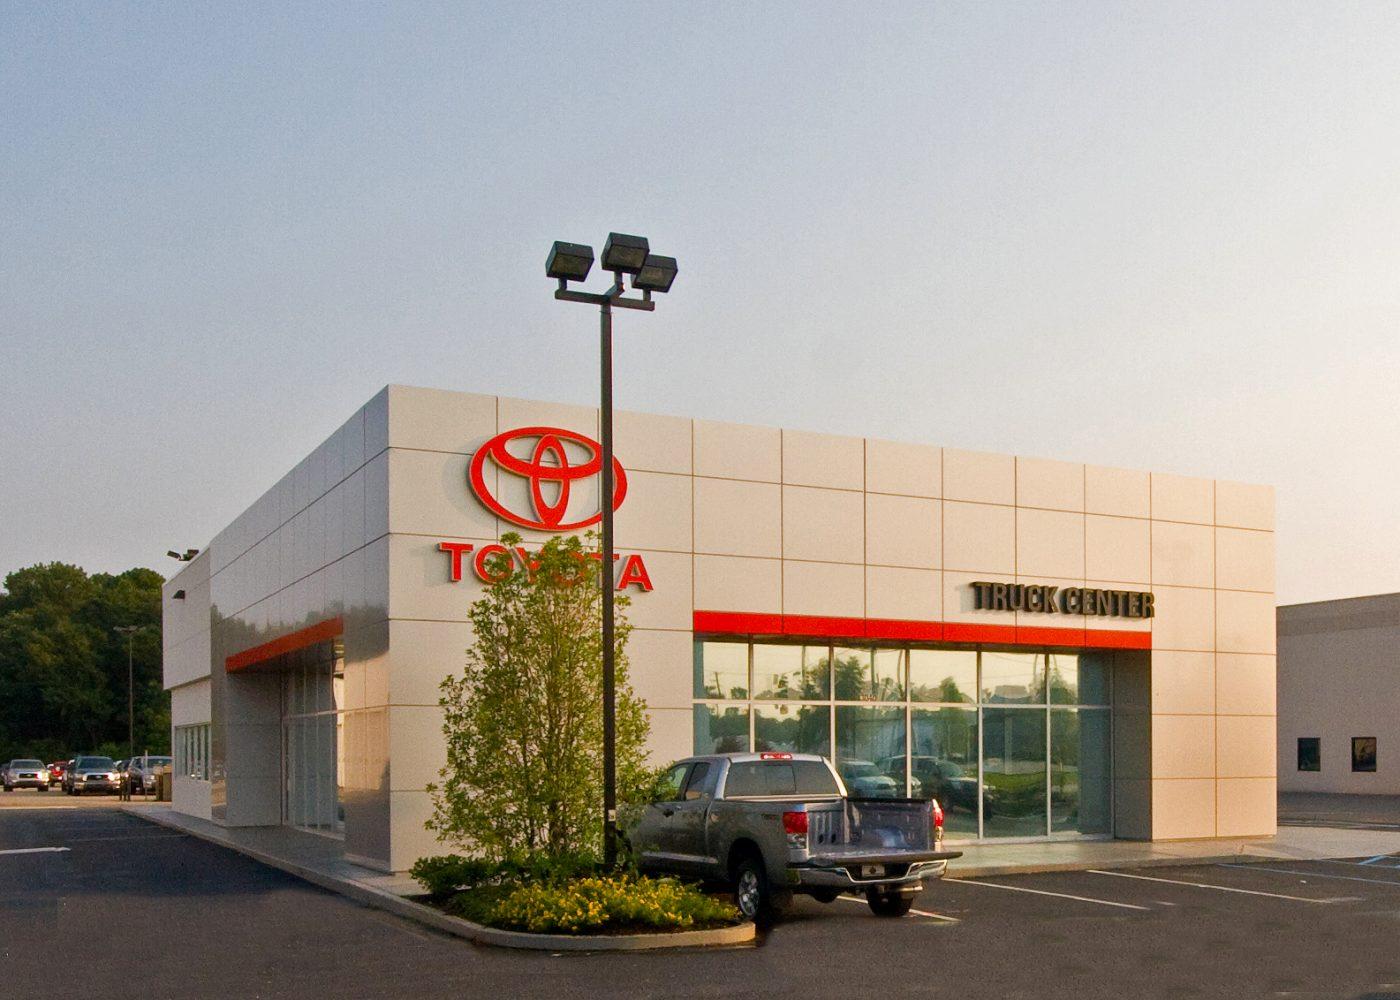 Springhill  Toyota  Truck  Center  Renovation  Mobile